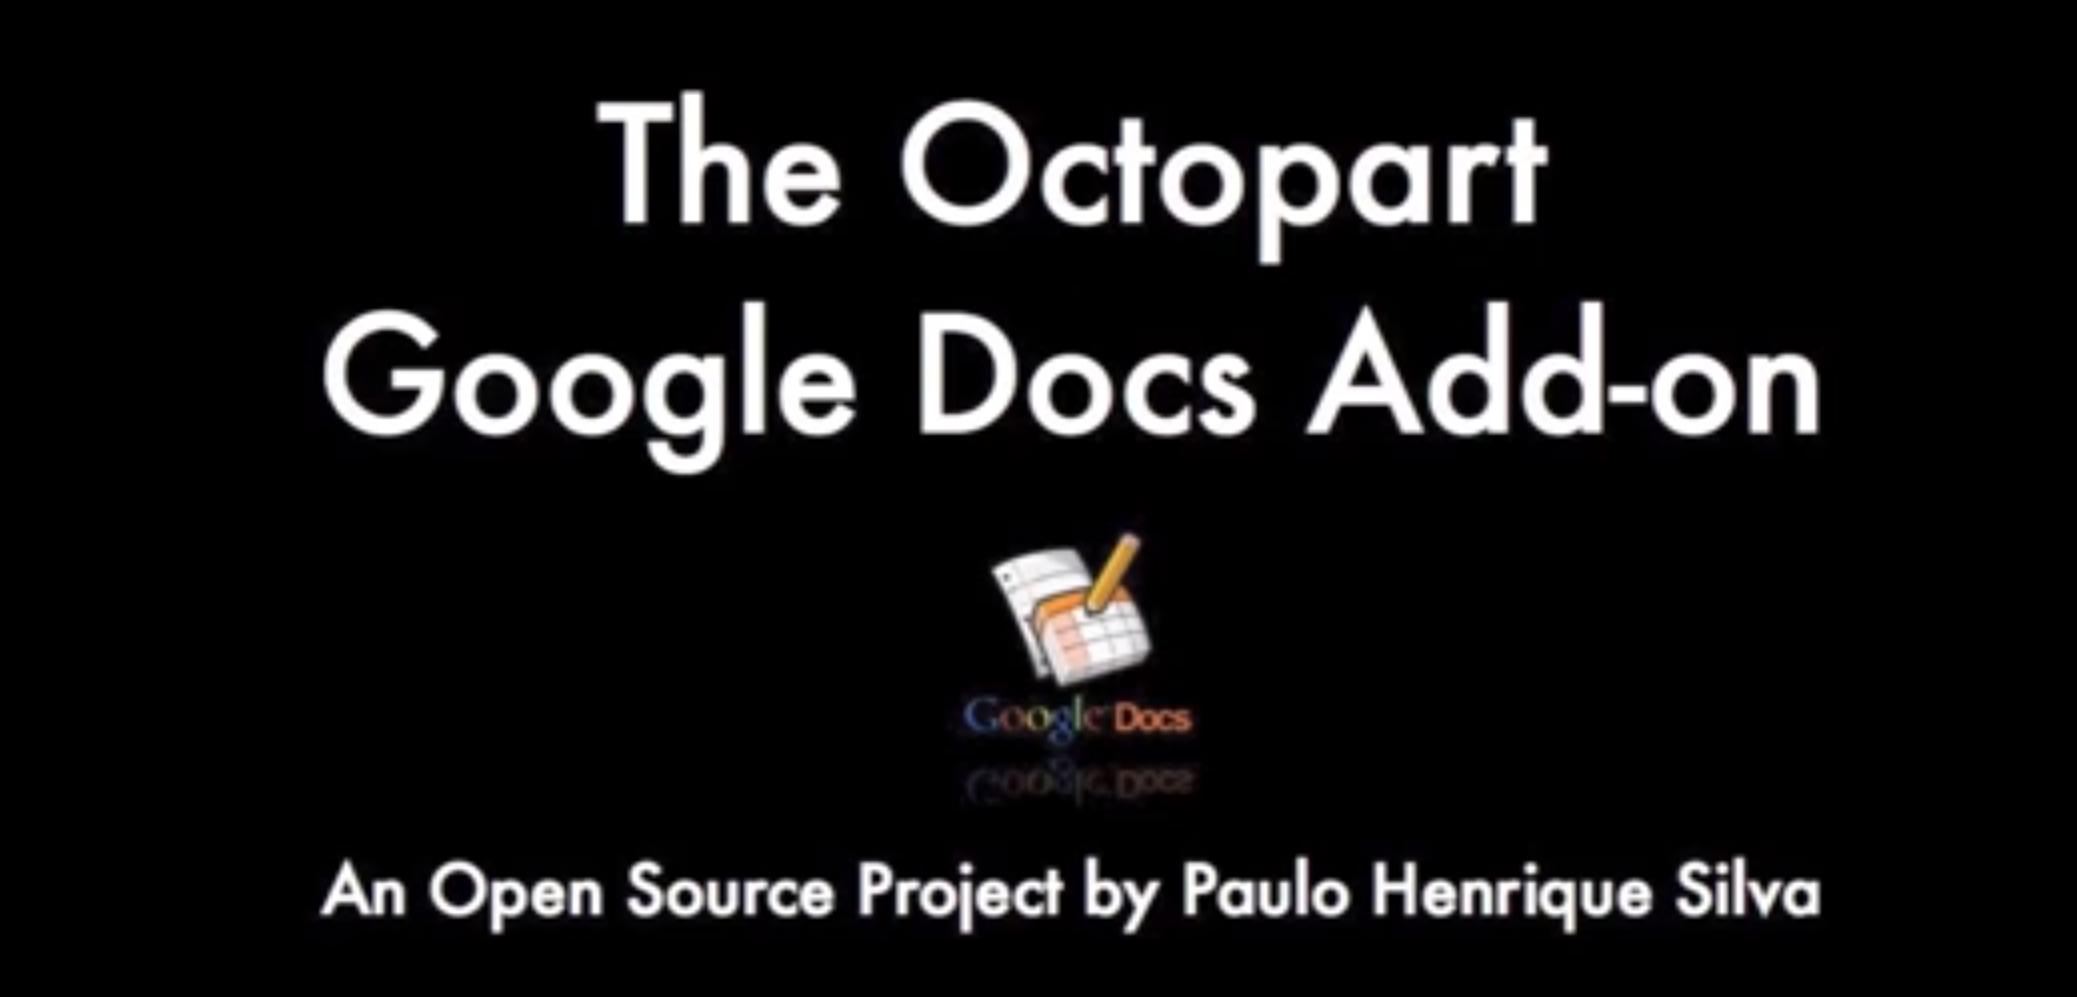 google apps add on paulo s open source project octopart